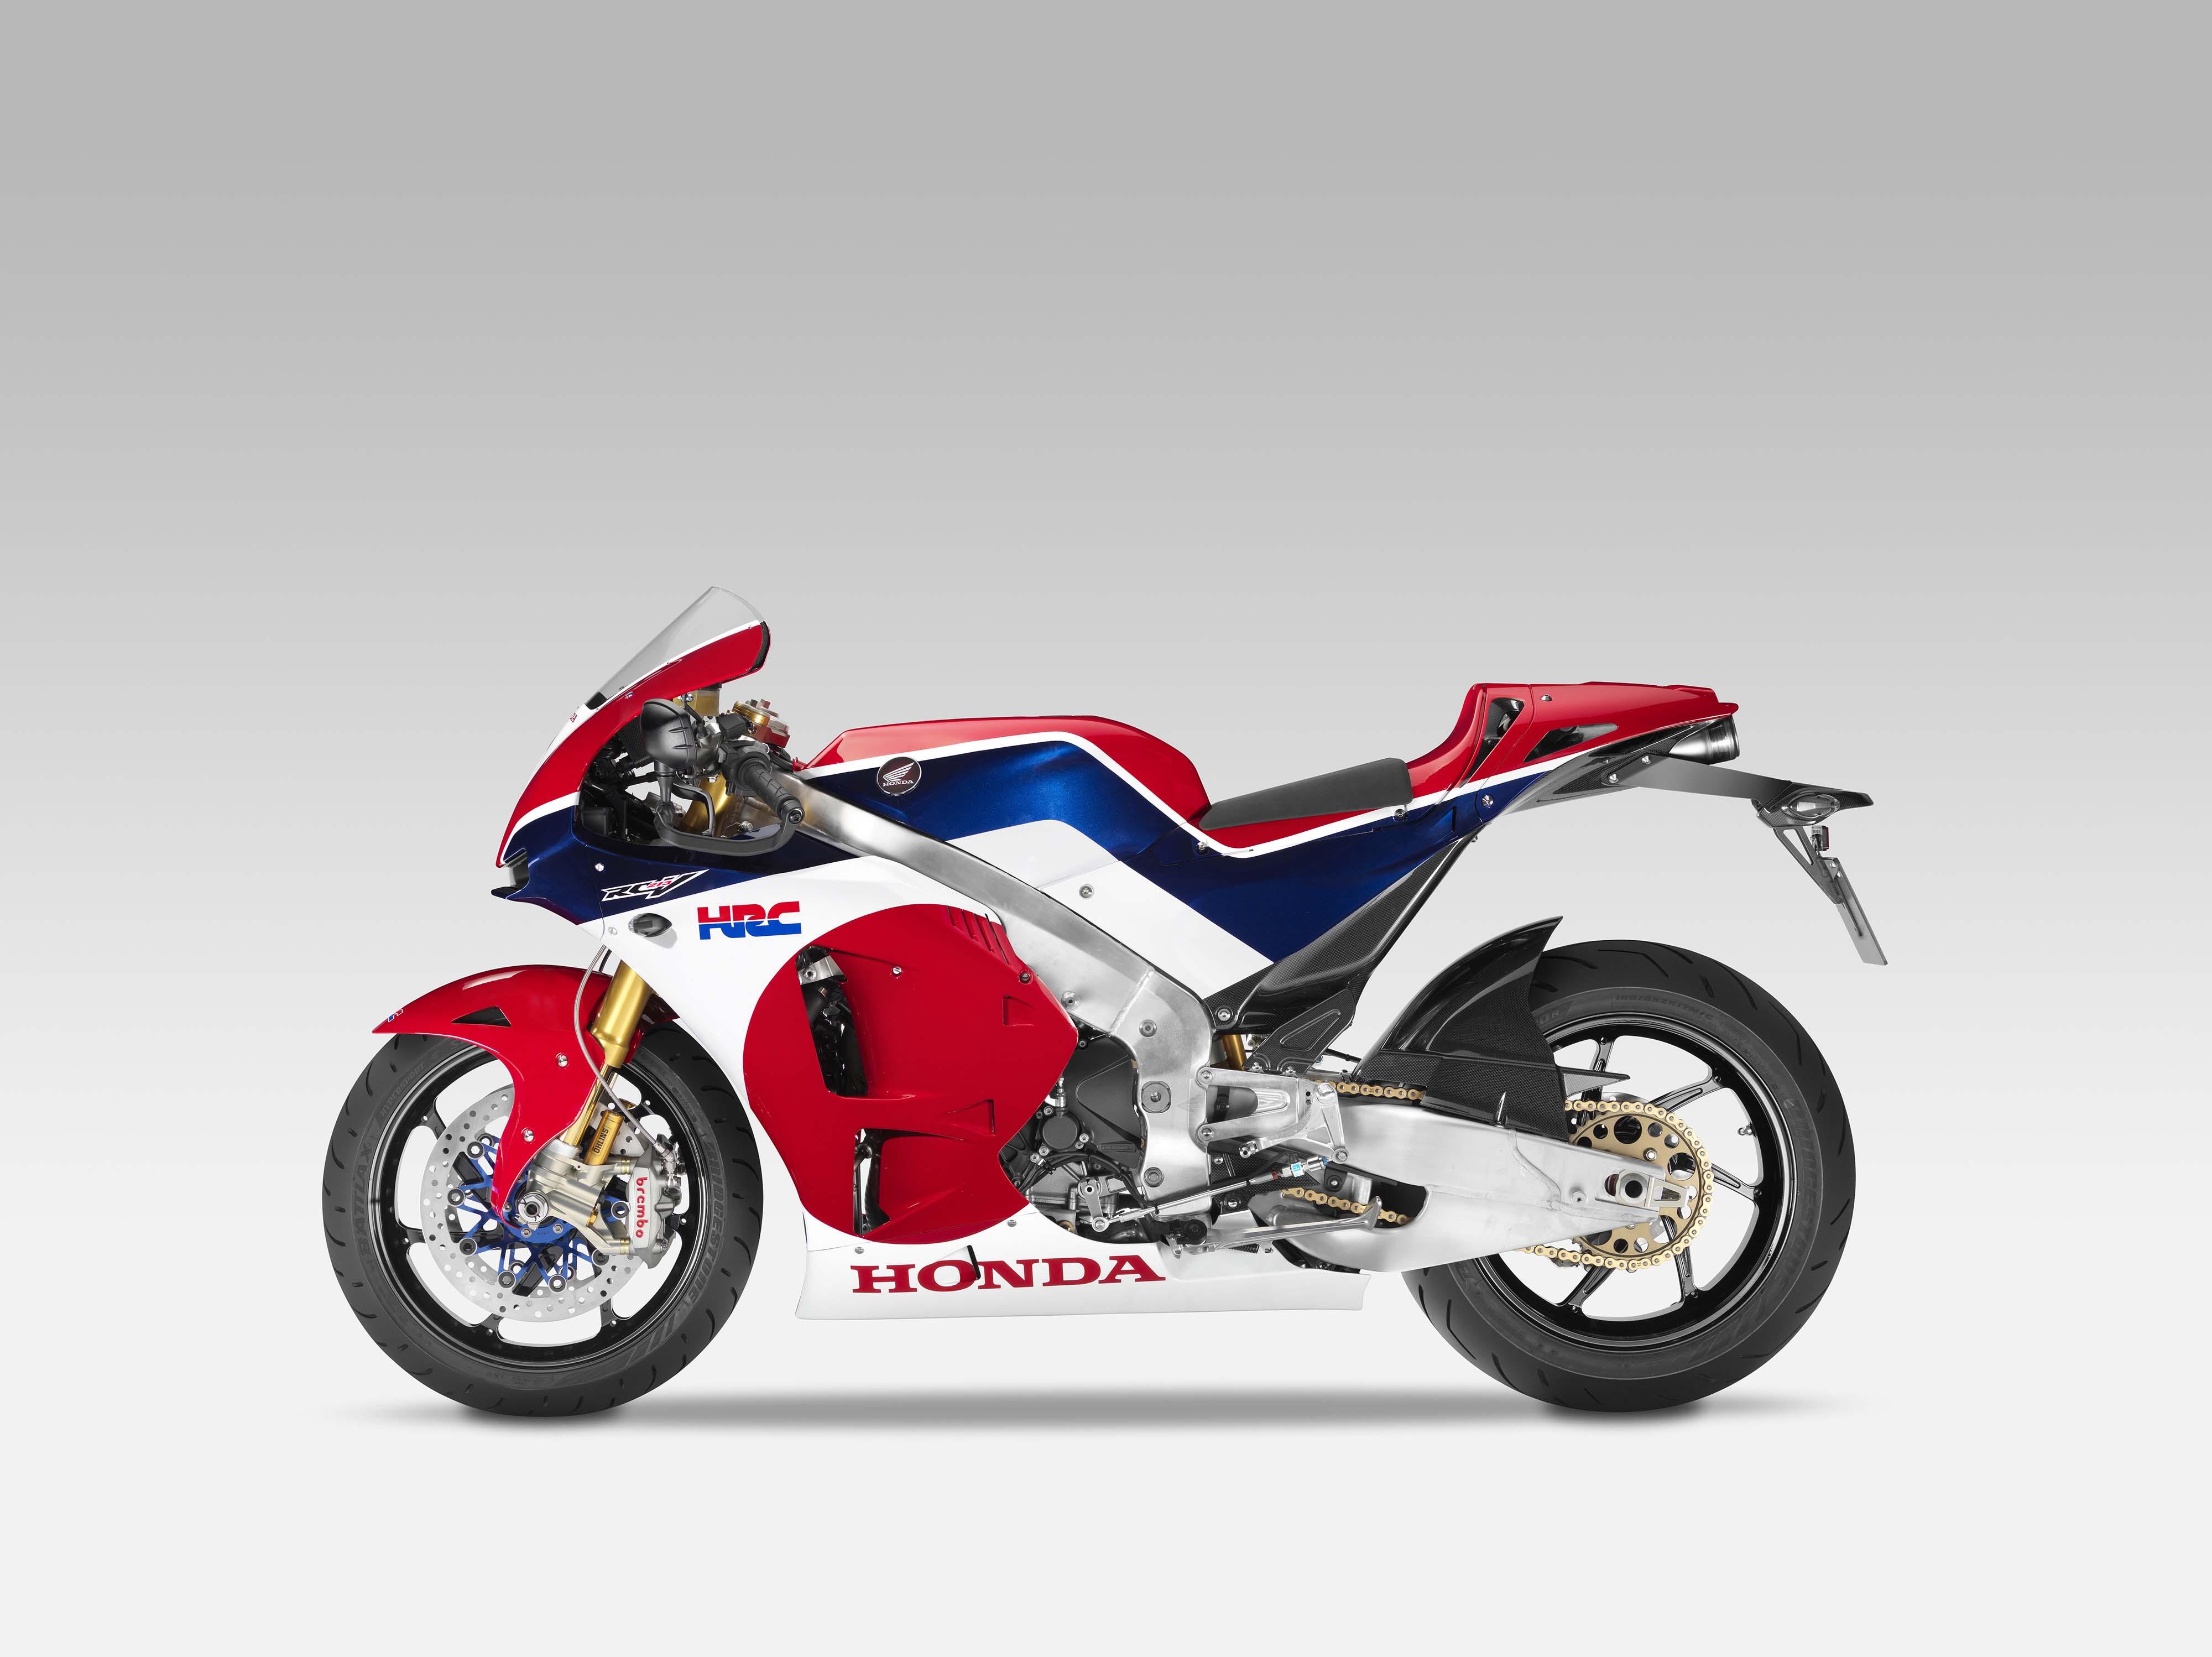 Honda RC213V-S 2015 2015-Honda-RC213V-S-prototype-02